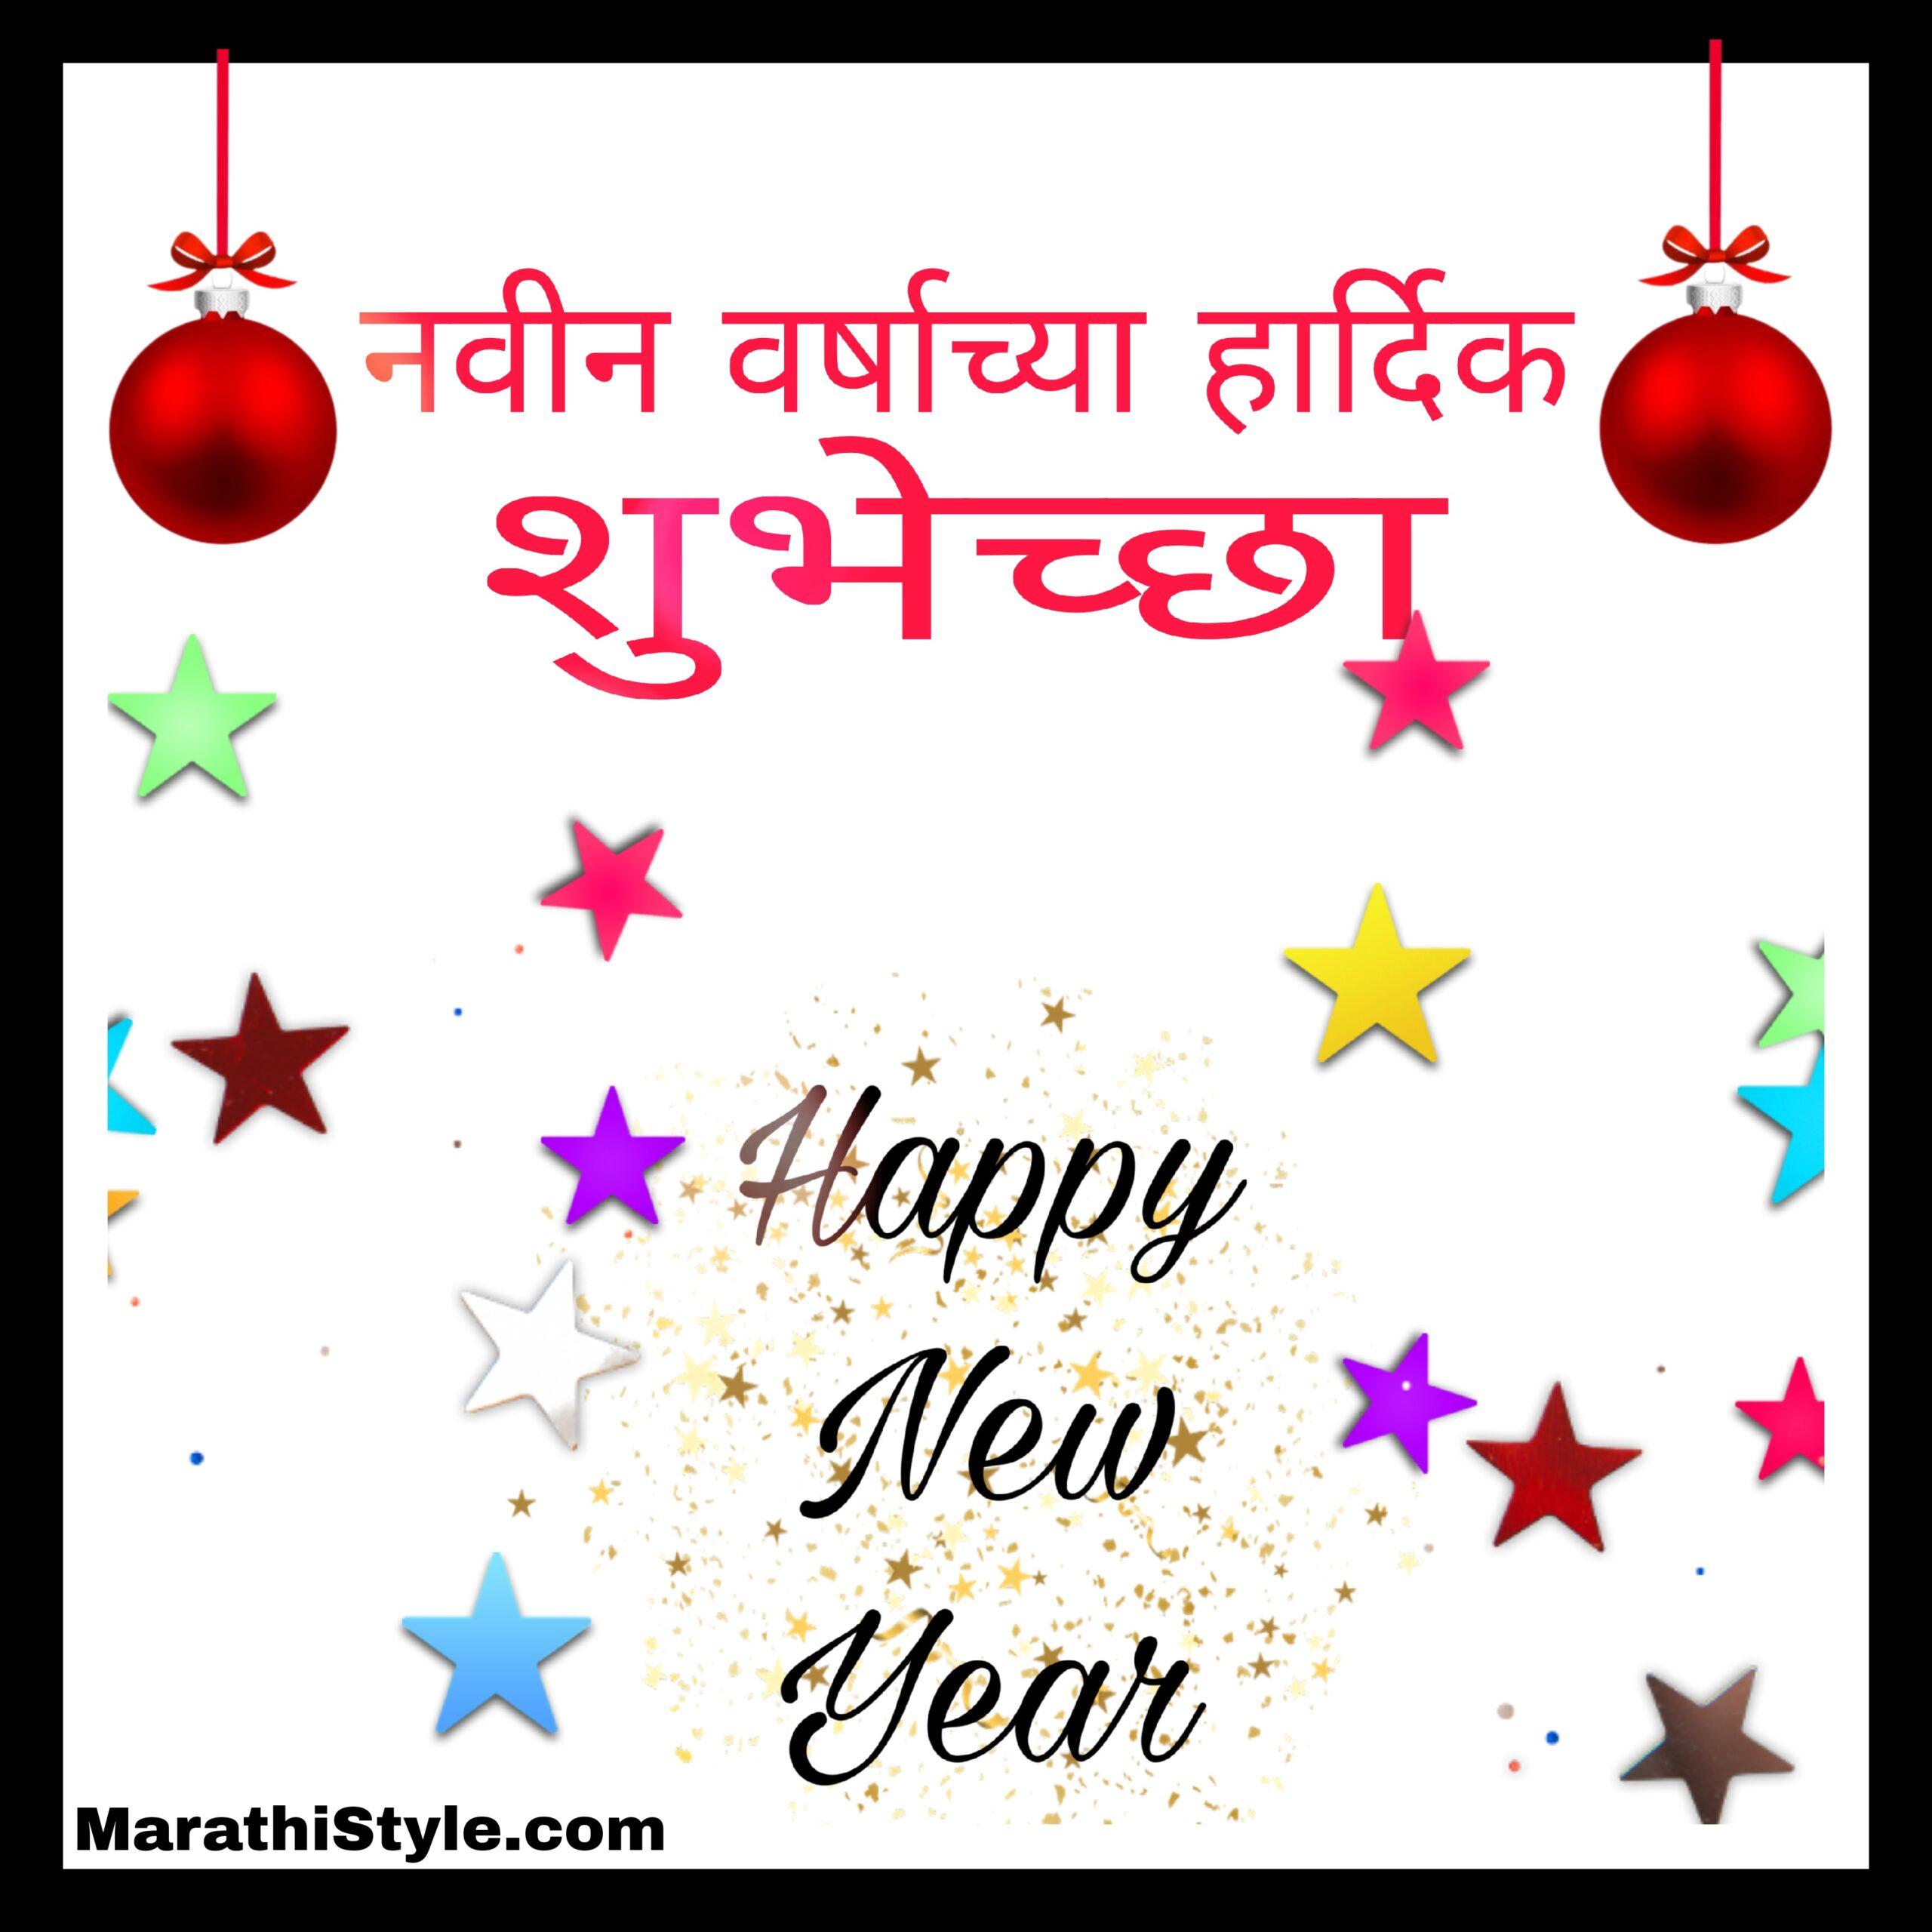 Marathi New Year msg 2021